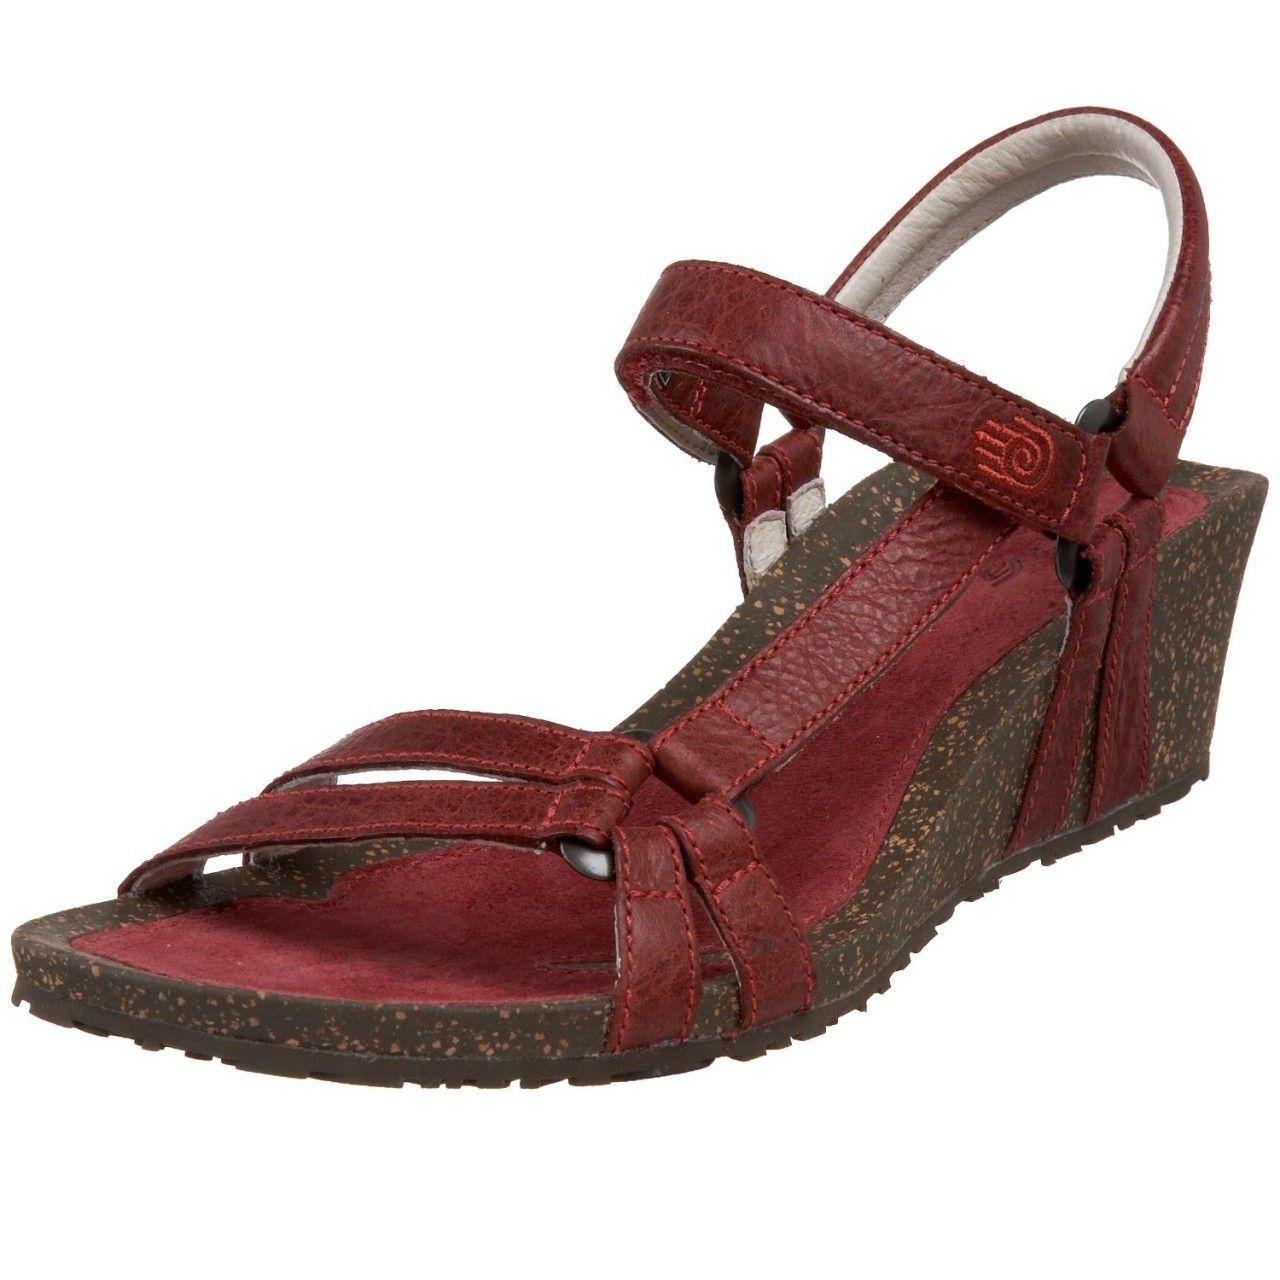 Teva Sandals My Style Pinboard Pinterest Sandals